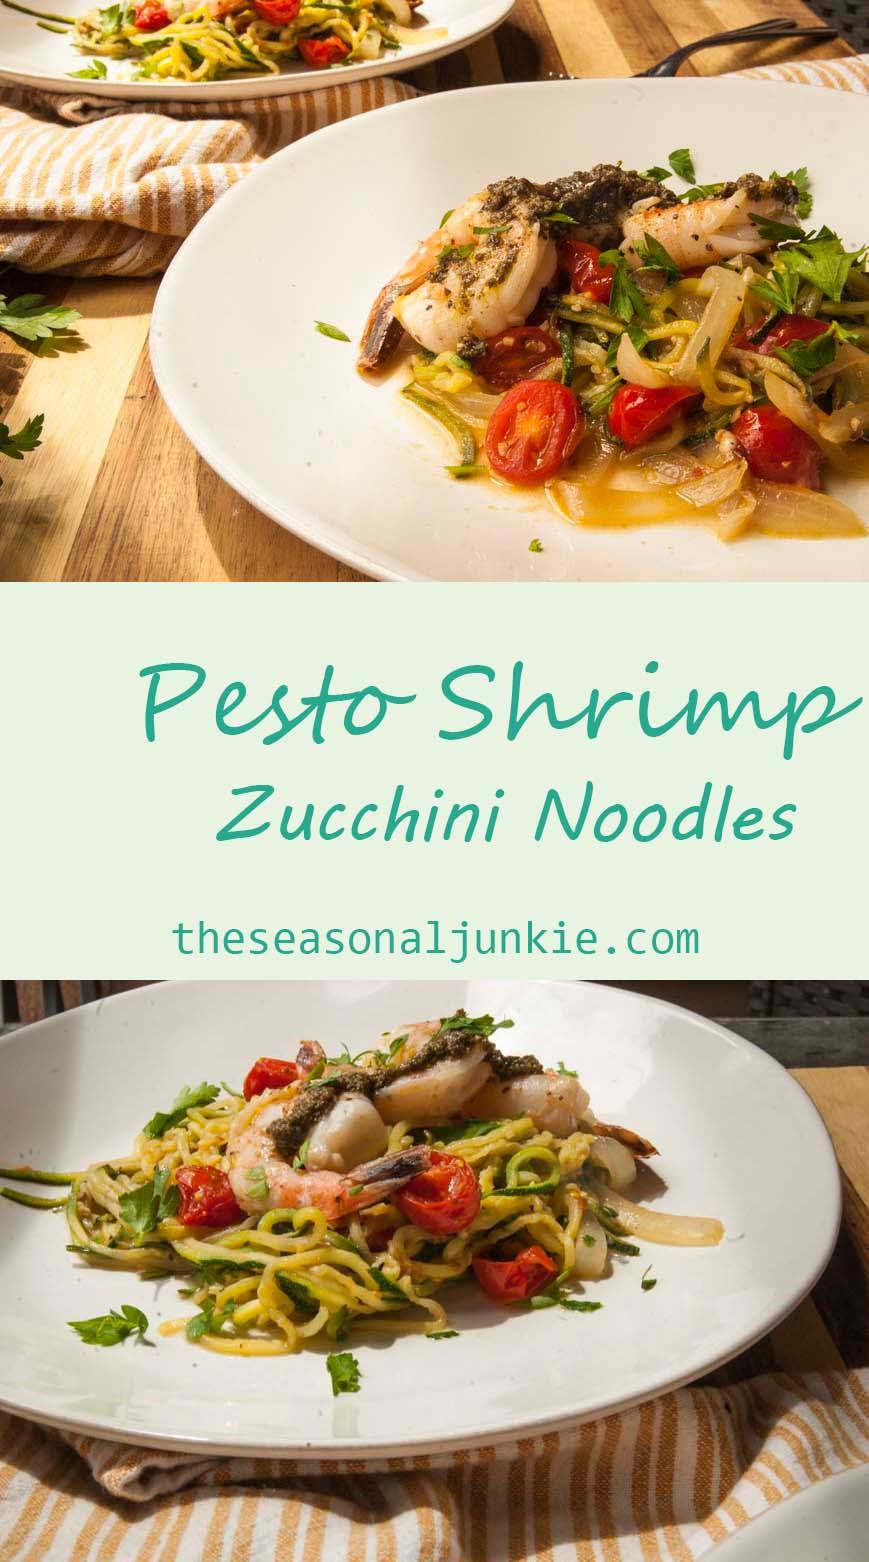 Pesto Shrimp Zucchini Noodles-The Season Junkie